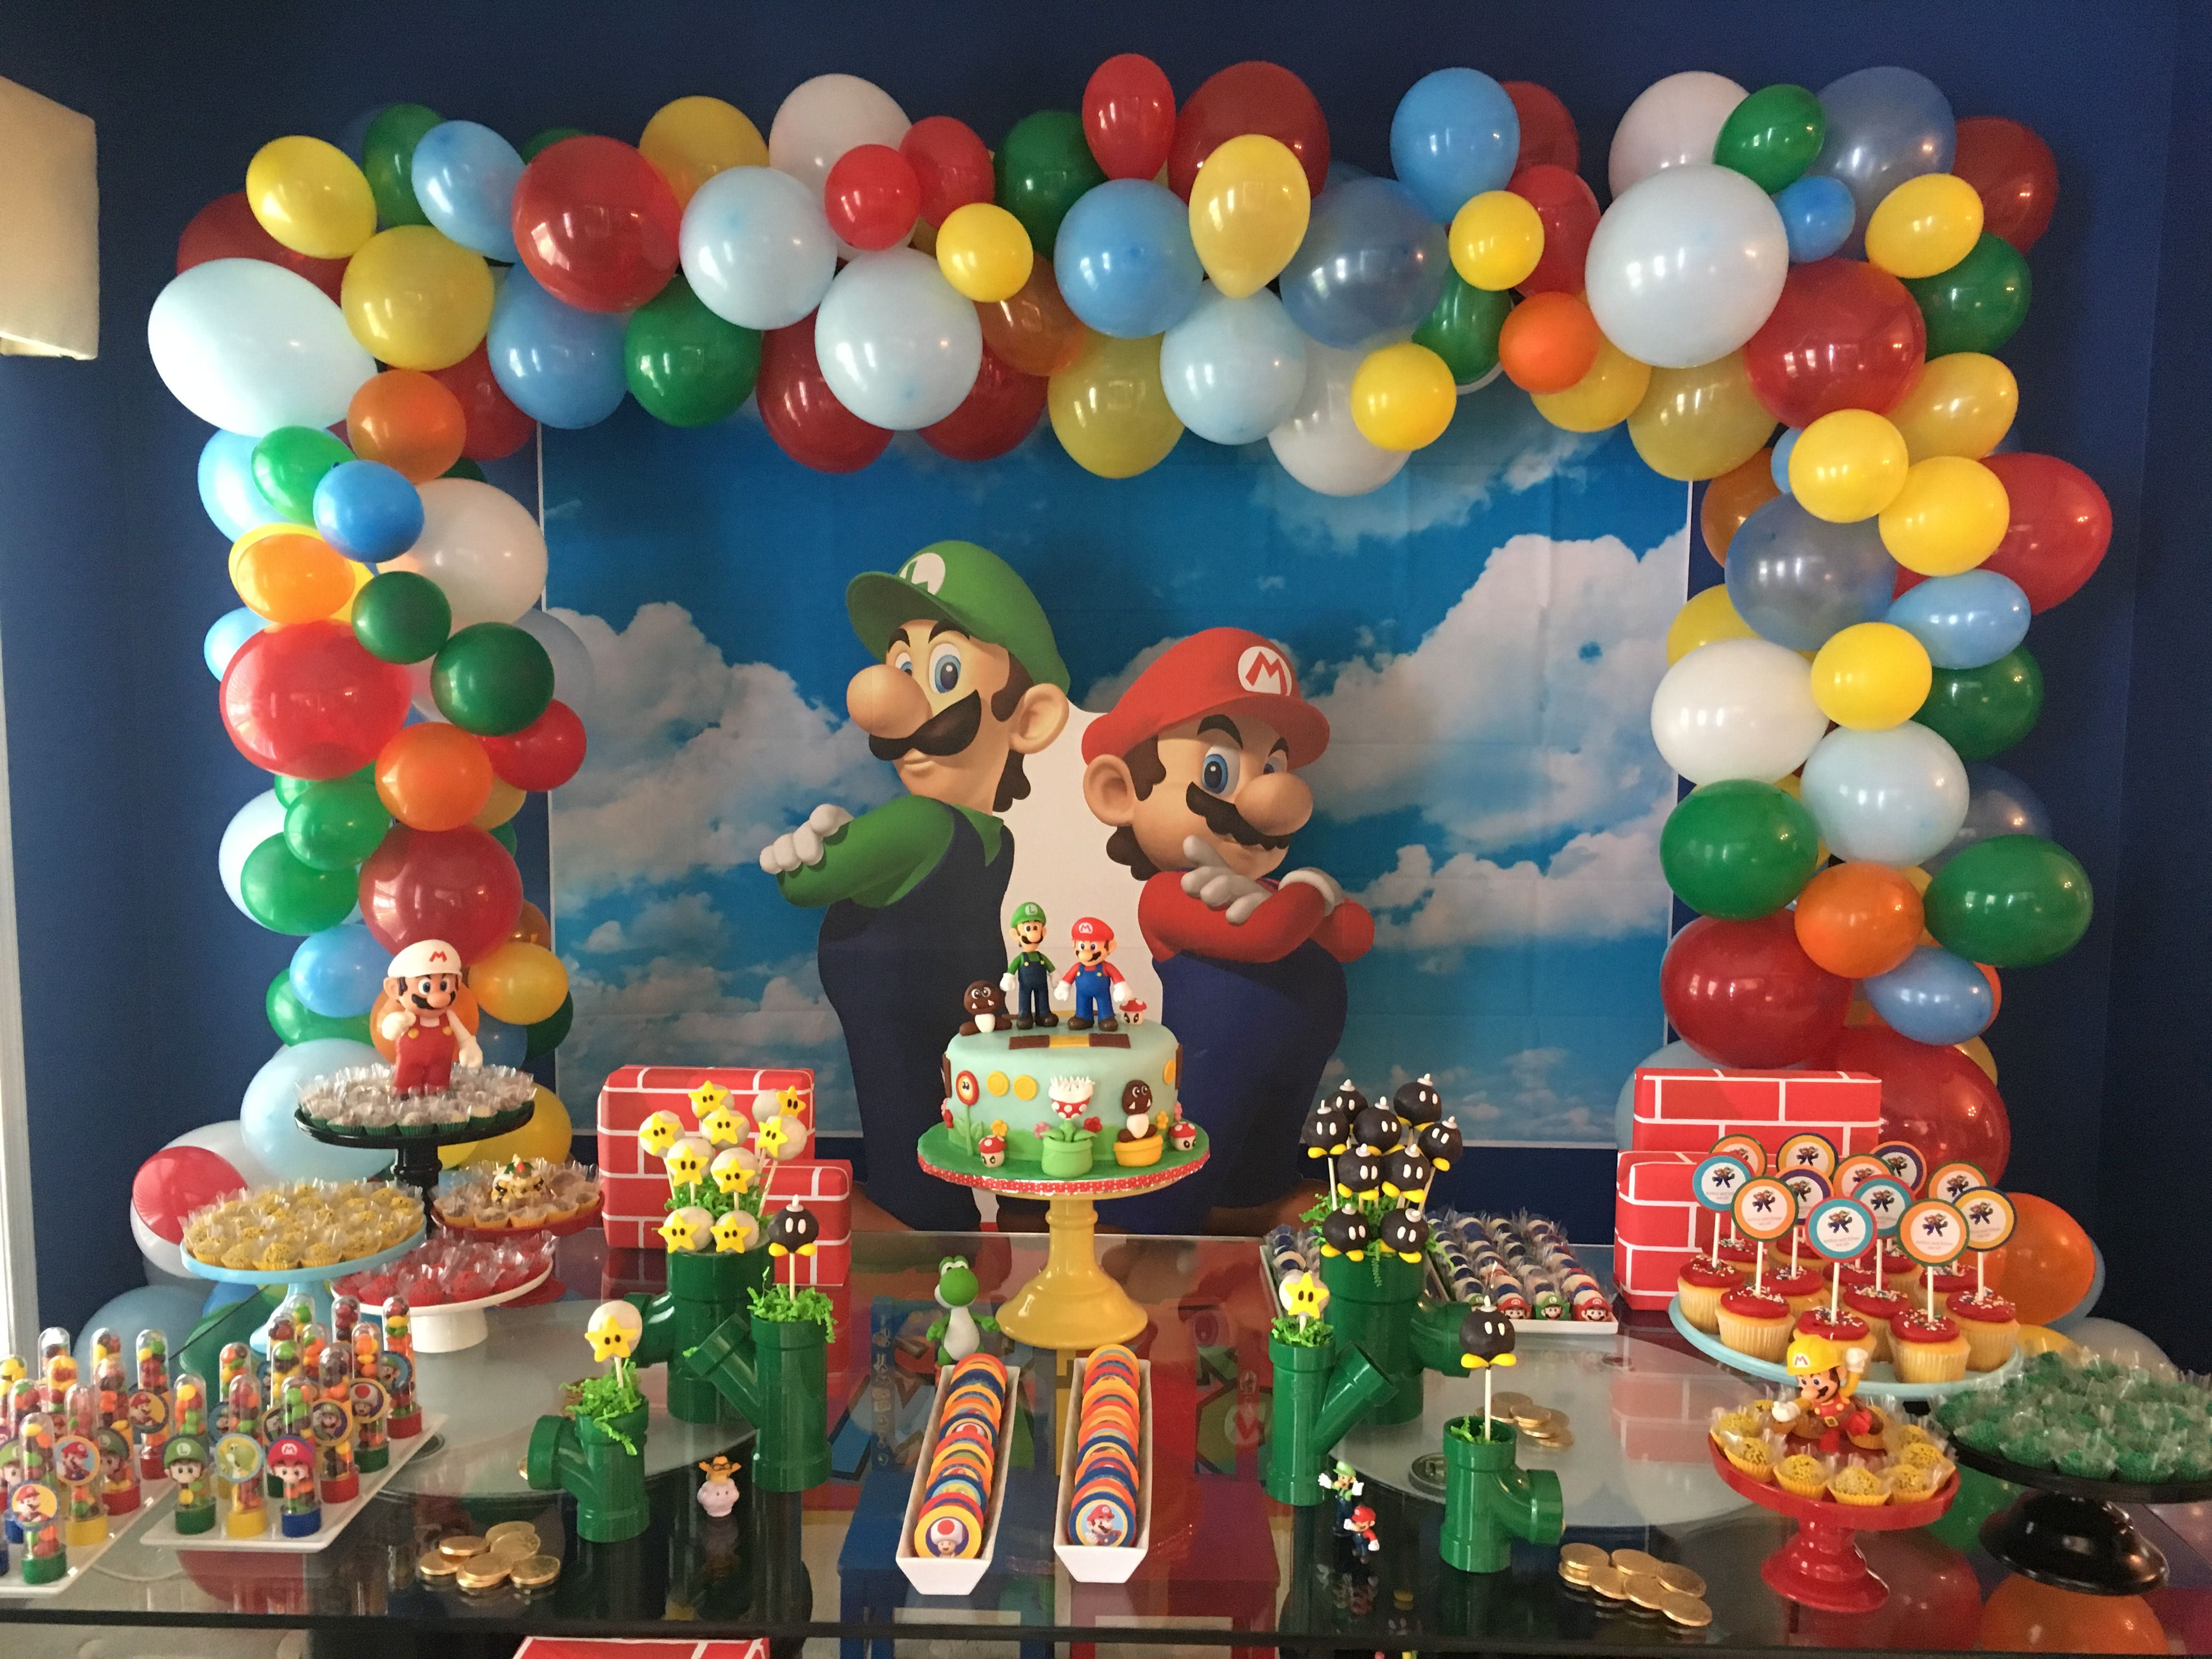 Mario and Luigi Birthday